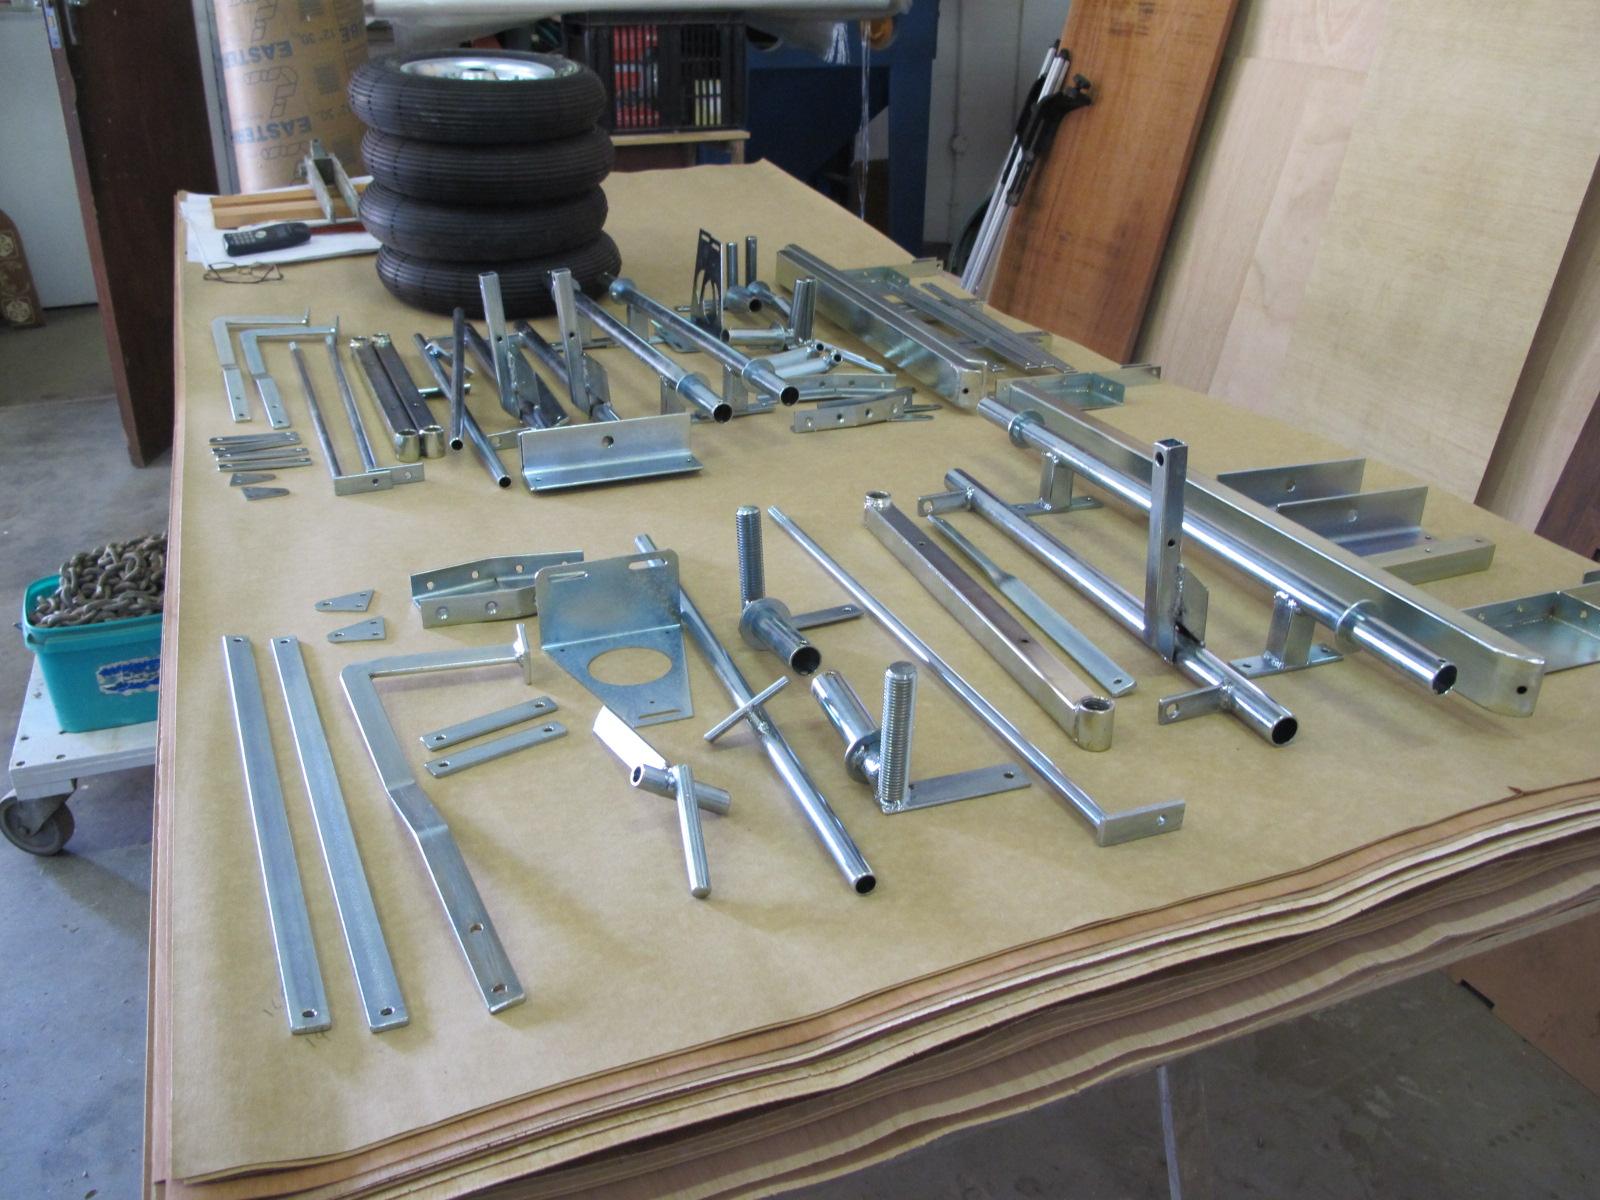 CKD Boats - Roy Mc Bride: Toylander engineering part sets